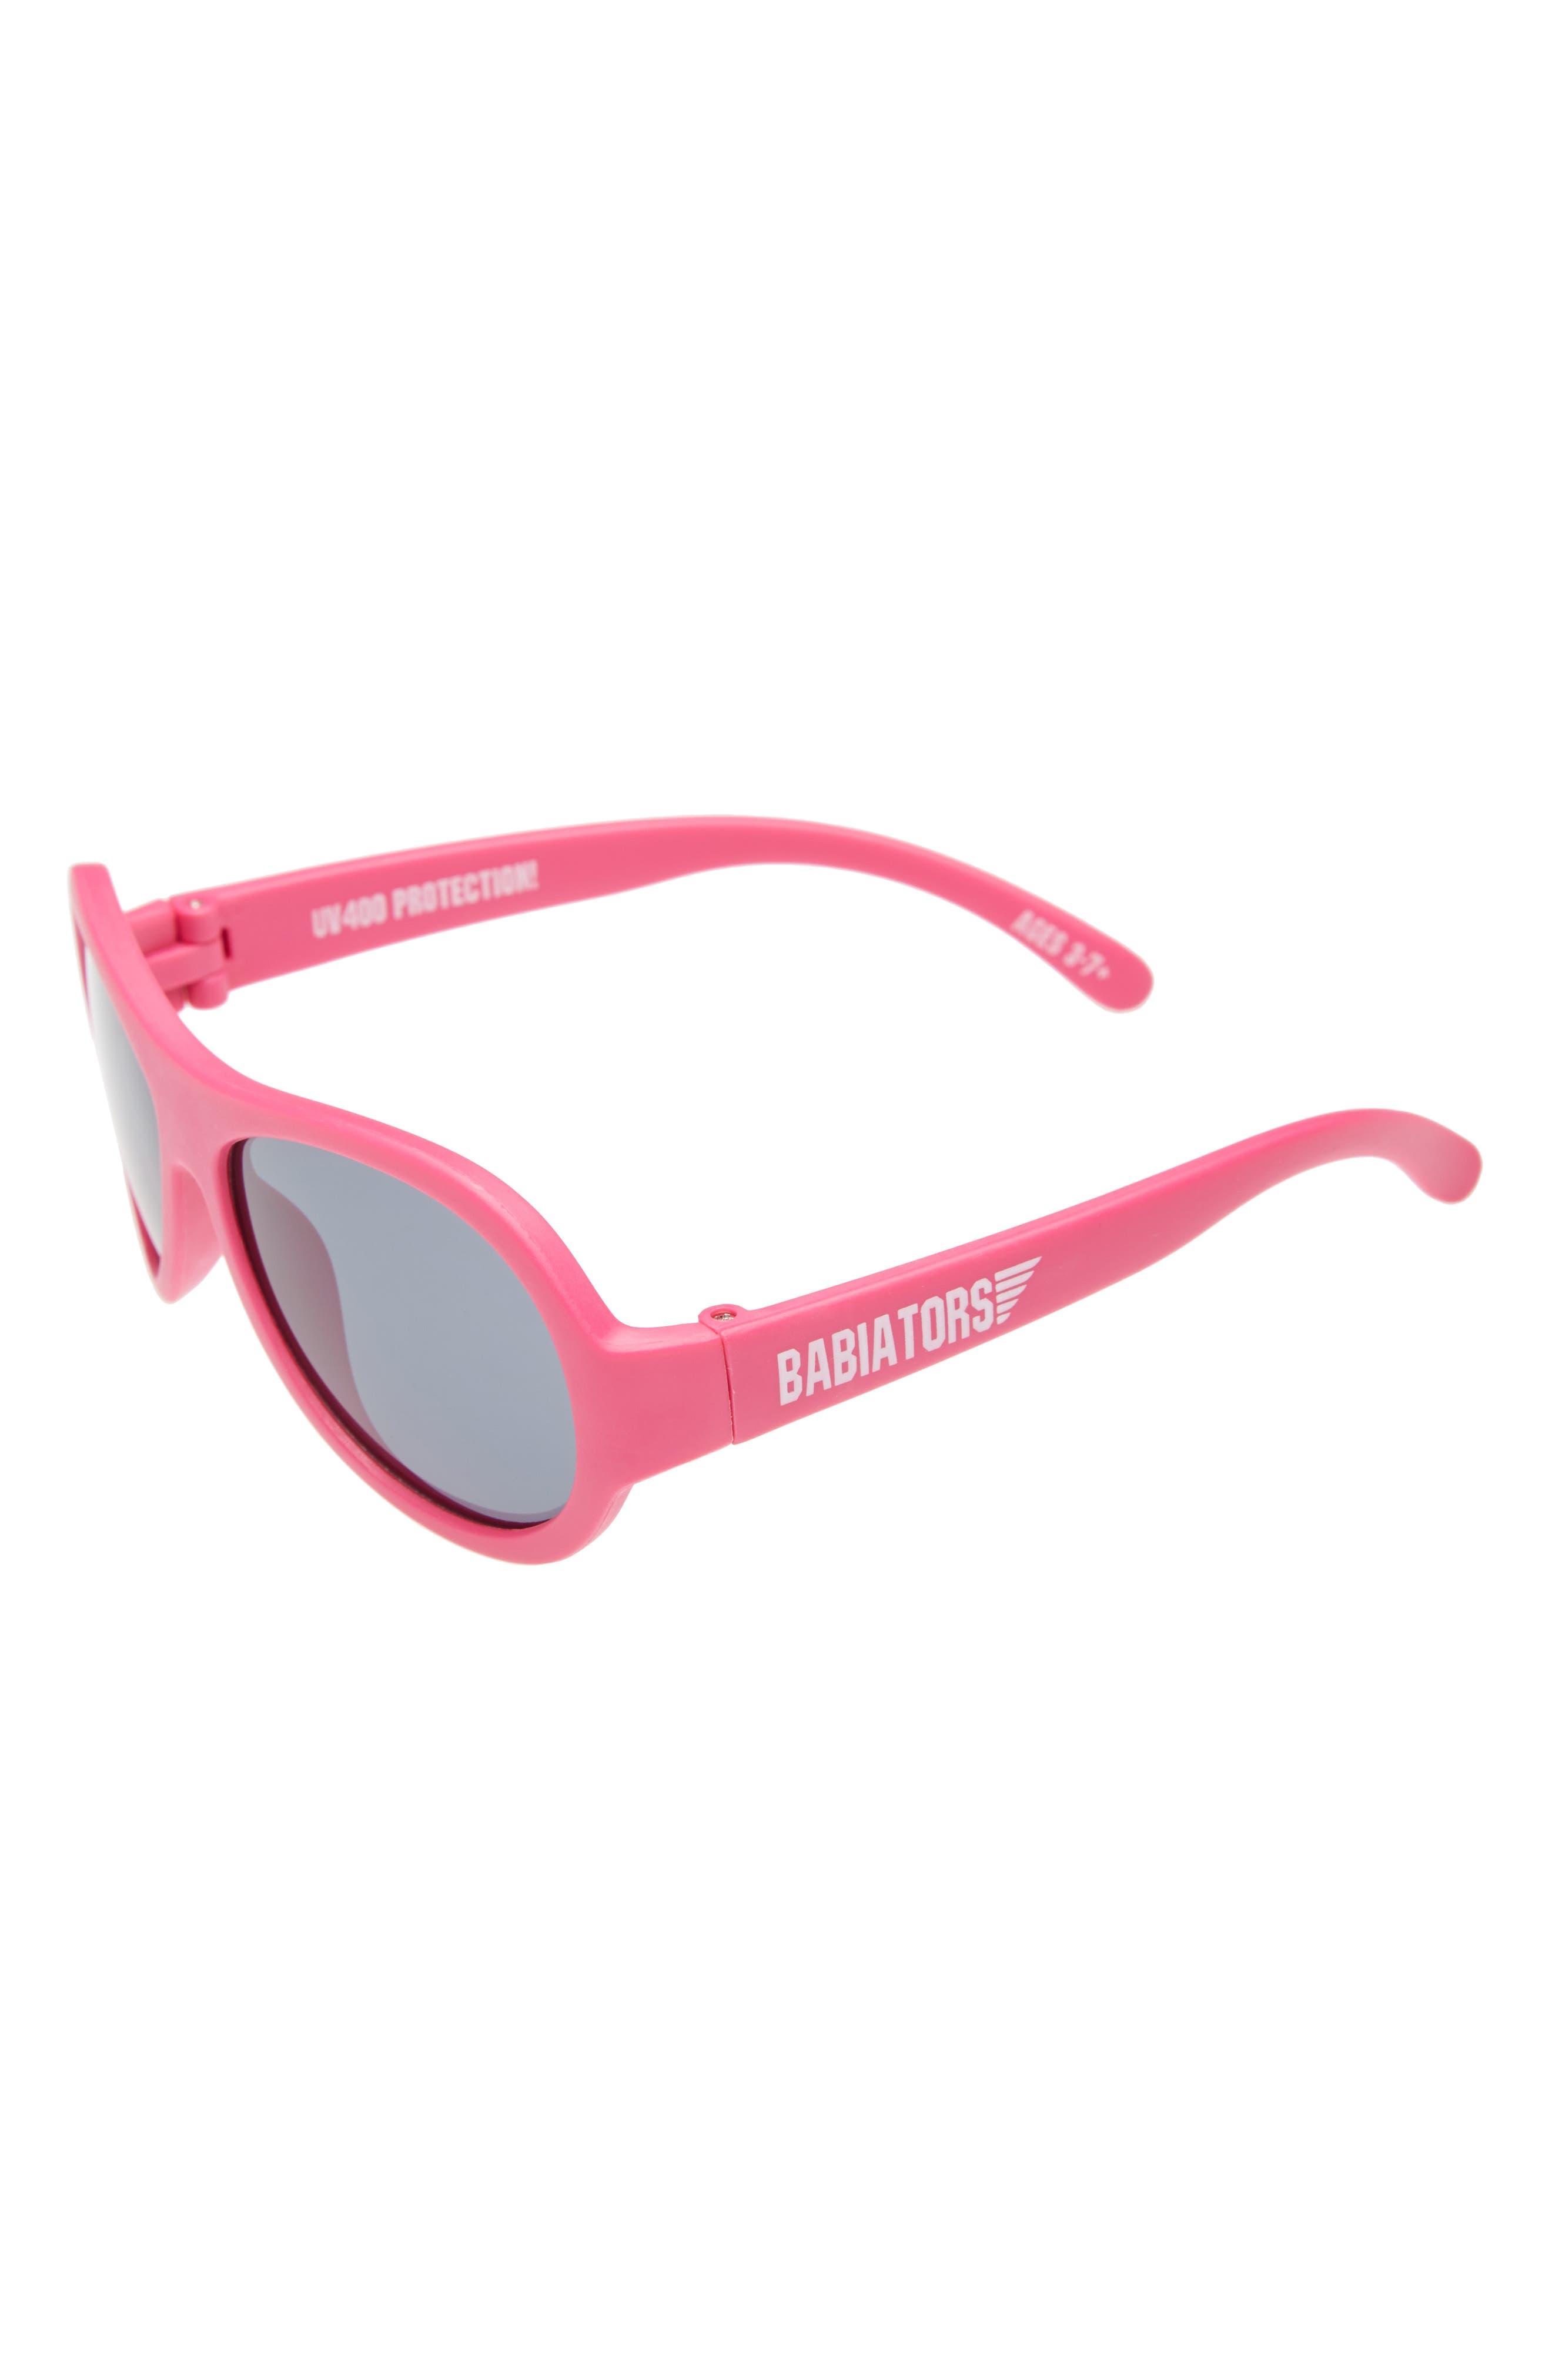 BABIATORS Original Aviator Sunglasses, Main, color, POPSTAR PINK